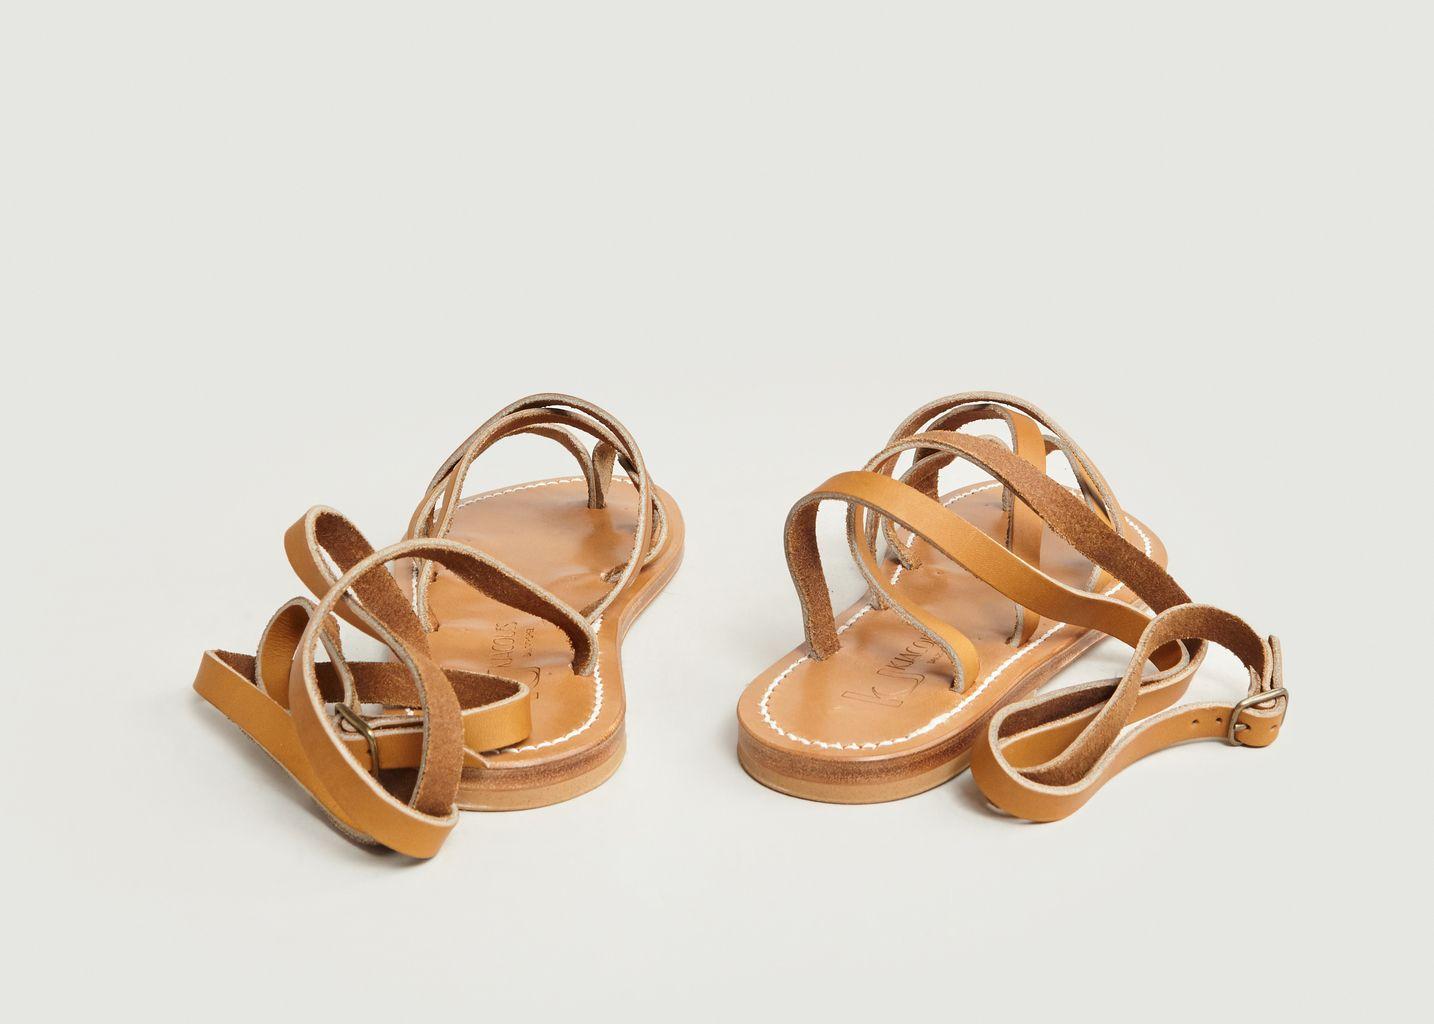 Sandales Zenobie - K Jacques